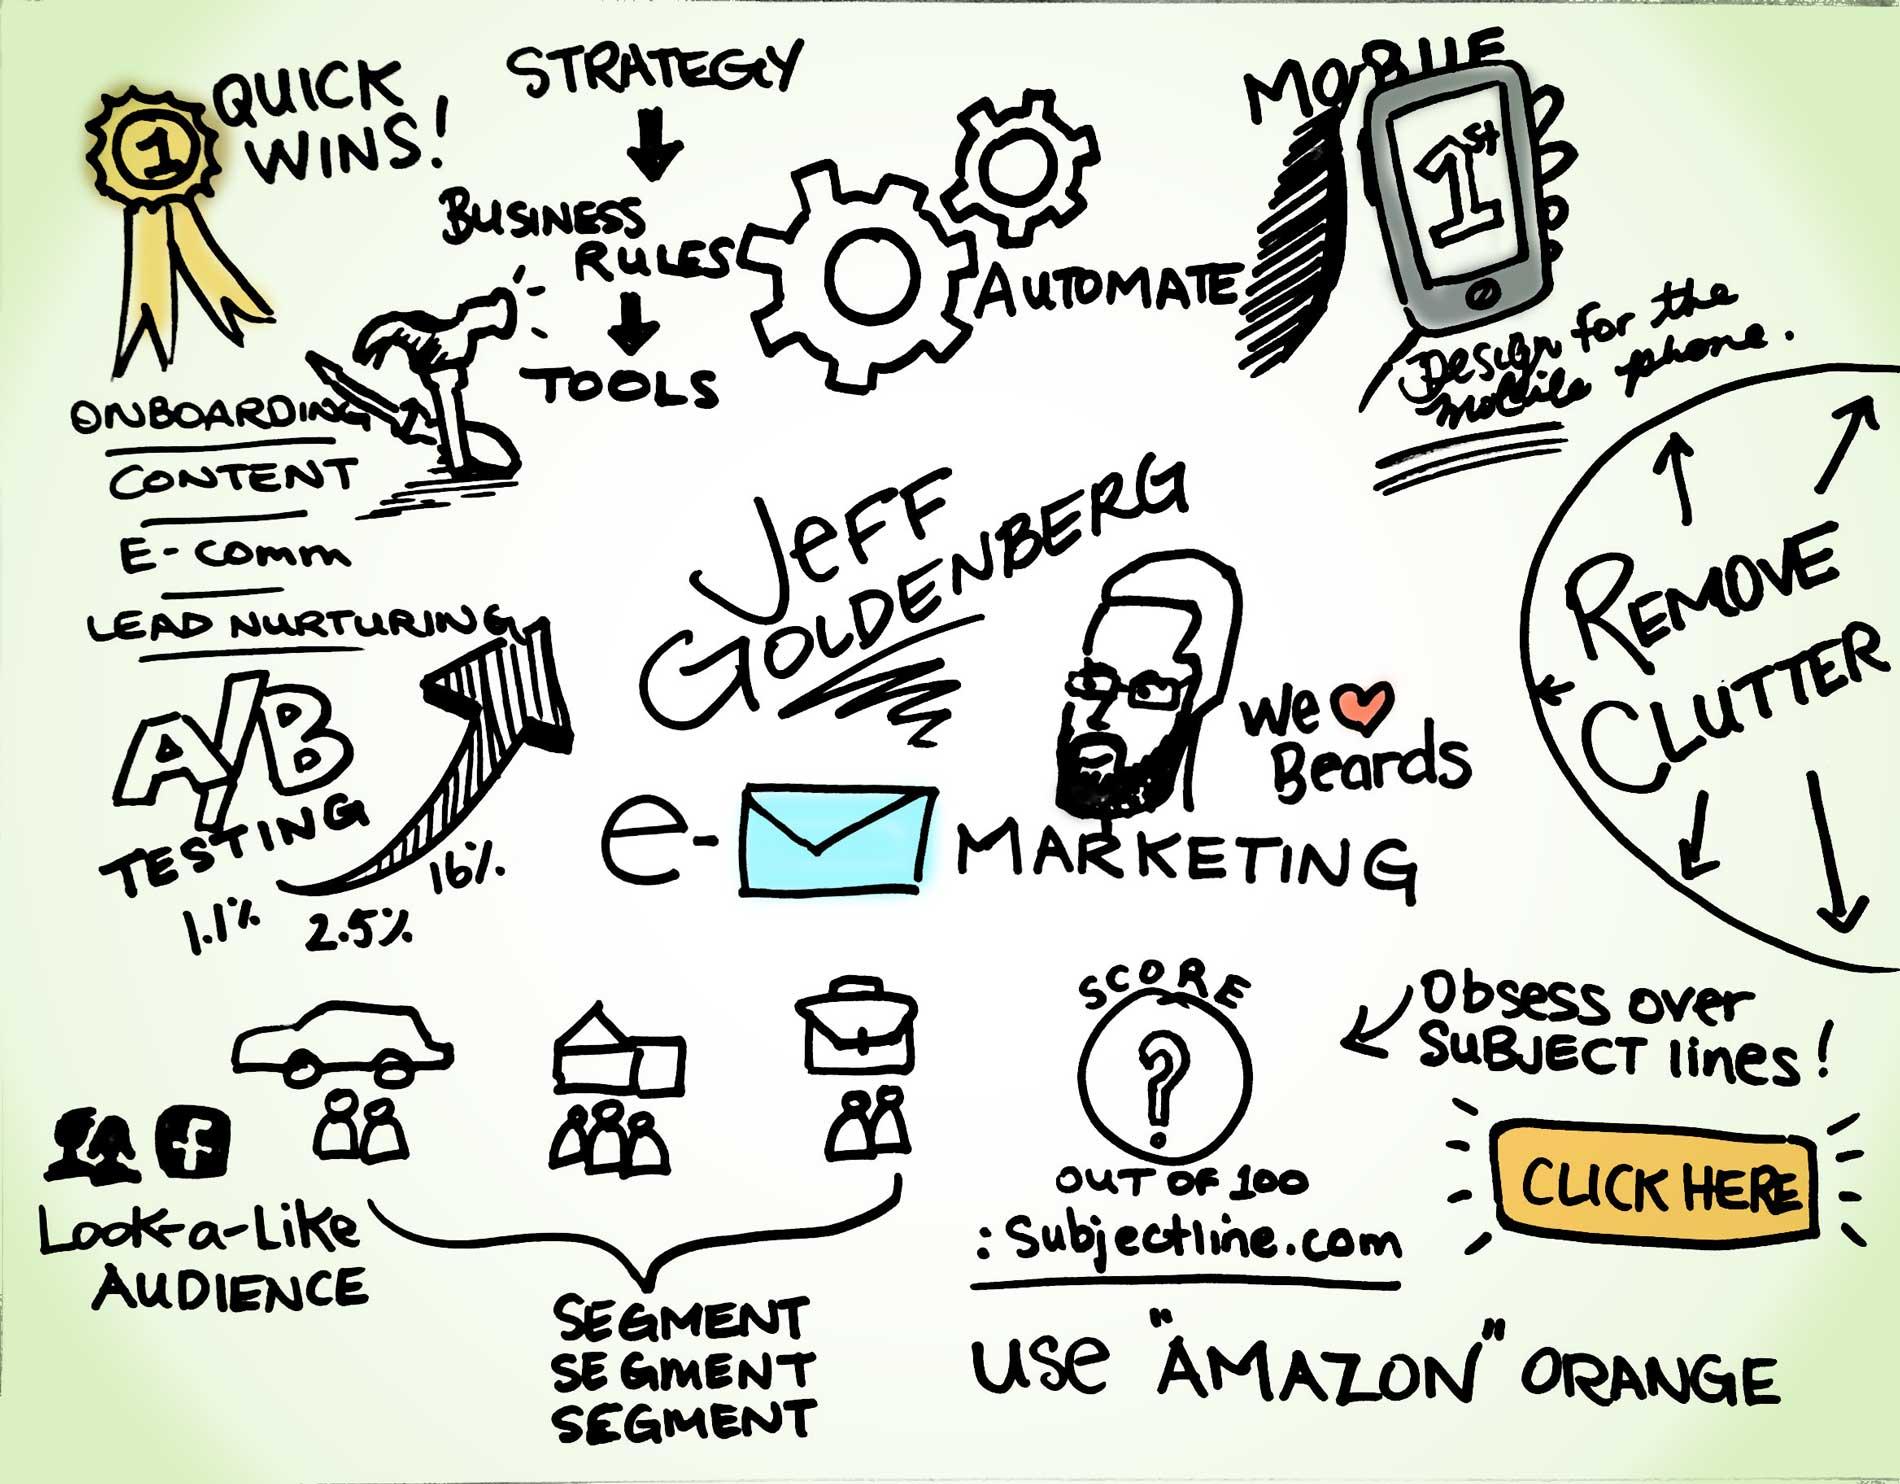 Jeff Goldenberg inboundcon presentation